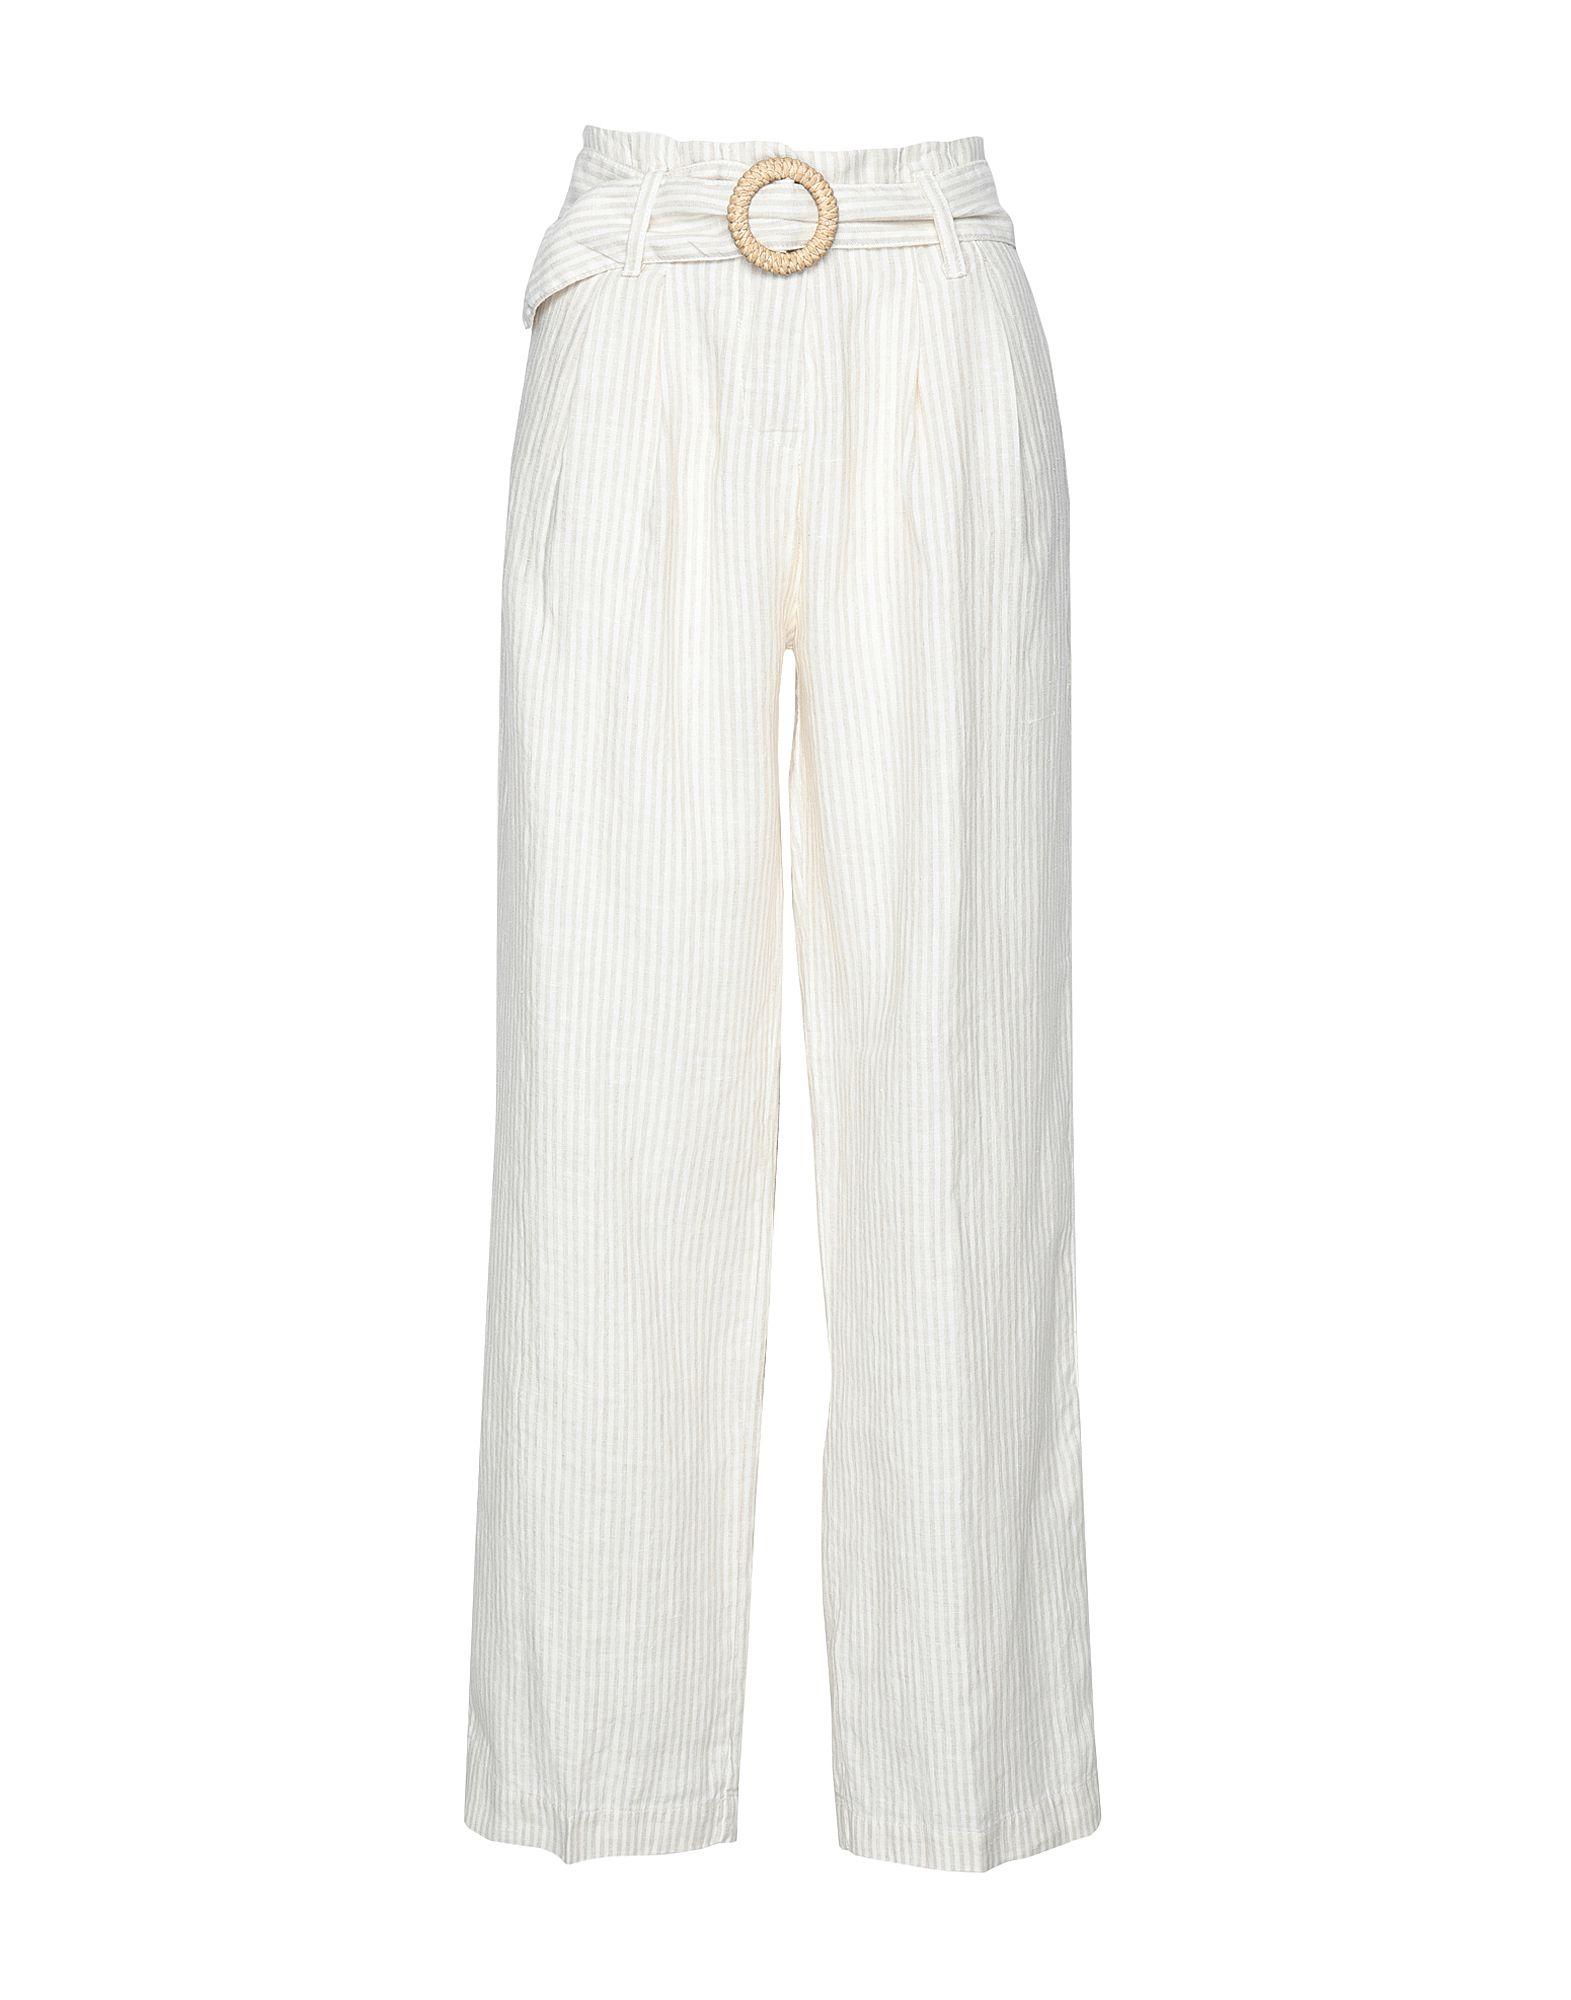 8 by YOOX Повседневные брюки машинка для стрижки волос scarlett sc hc63c07